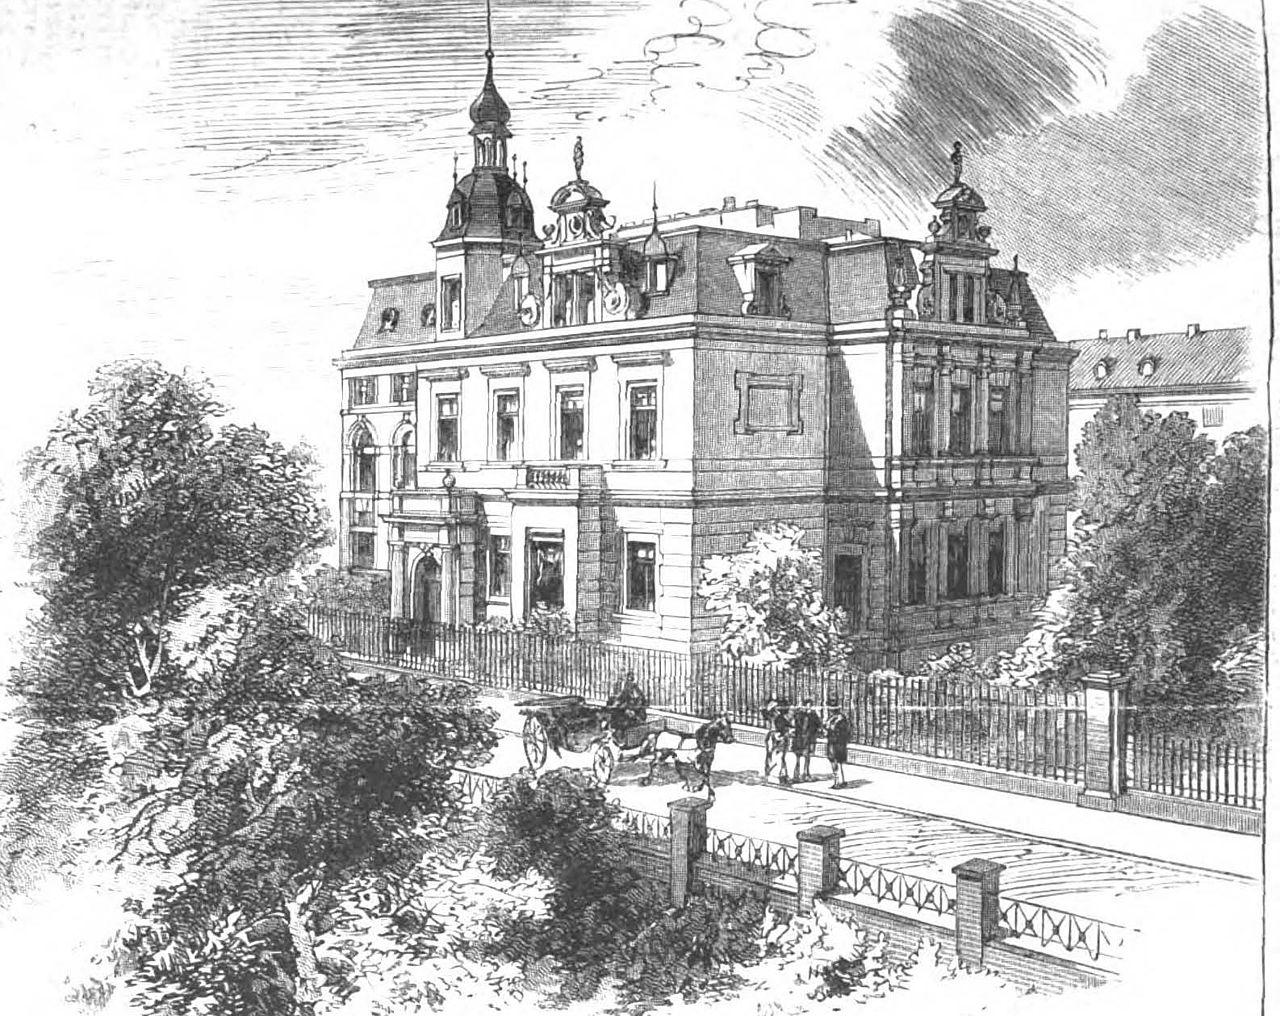 file b ulmenstr villa prof gussow illustrirte zeitung 1885 84 wikimedia commons. Black Bedroom Furniture Sets. Home Design Ideas